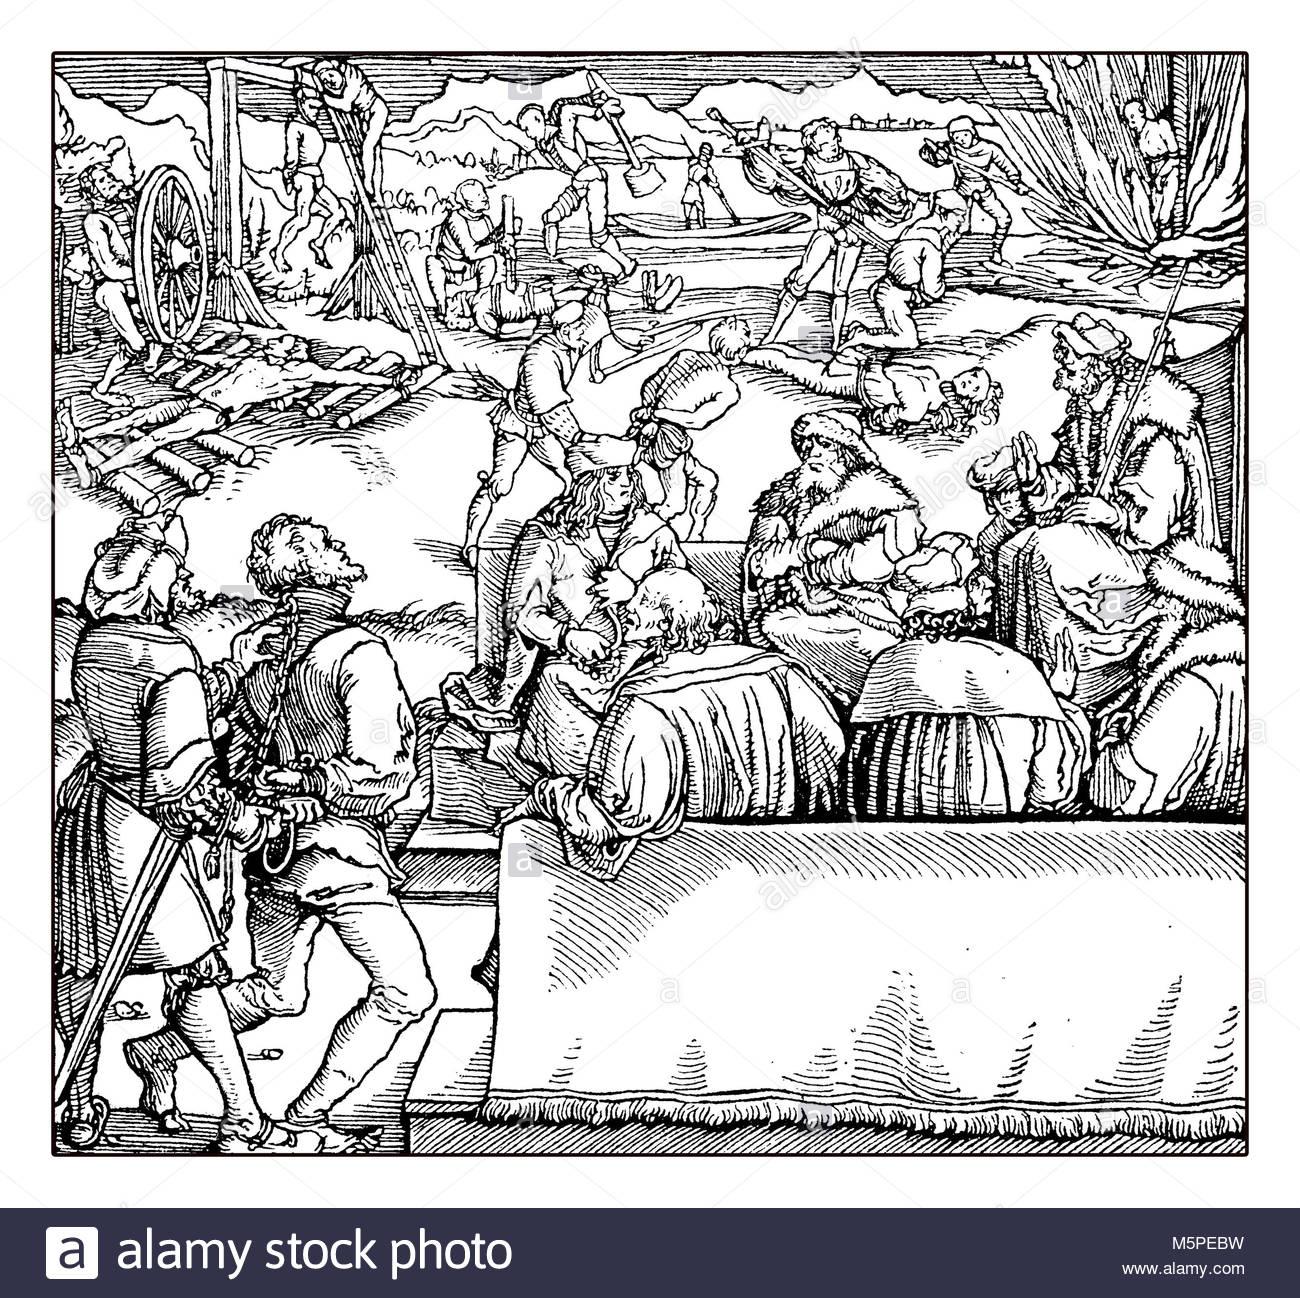 1300x1298 Medieval Punishment Stock Photos Amp Medieval Punishment Stock